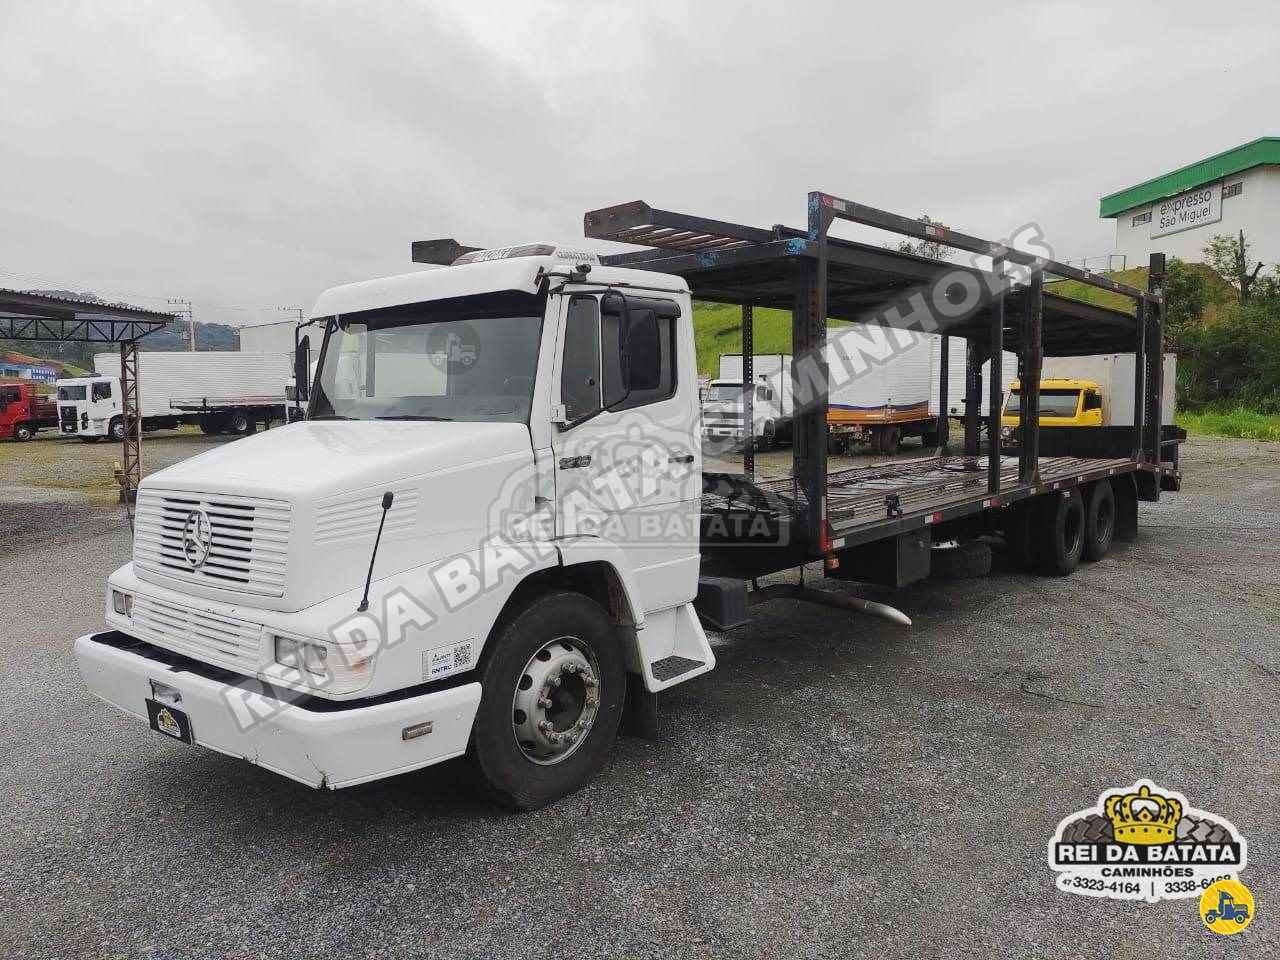 CAMINHAO MERCEDES-BENZ MB 1218 Cegonha Truck 6x2 Rei da Batata Caminhões BLUMENAU SANTA CATARINA SC